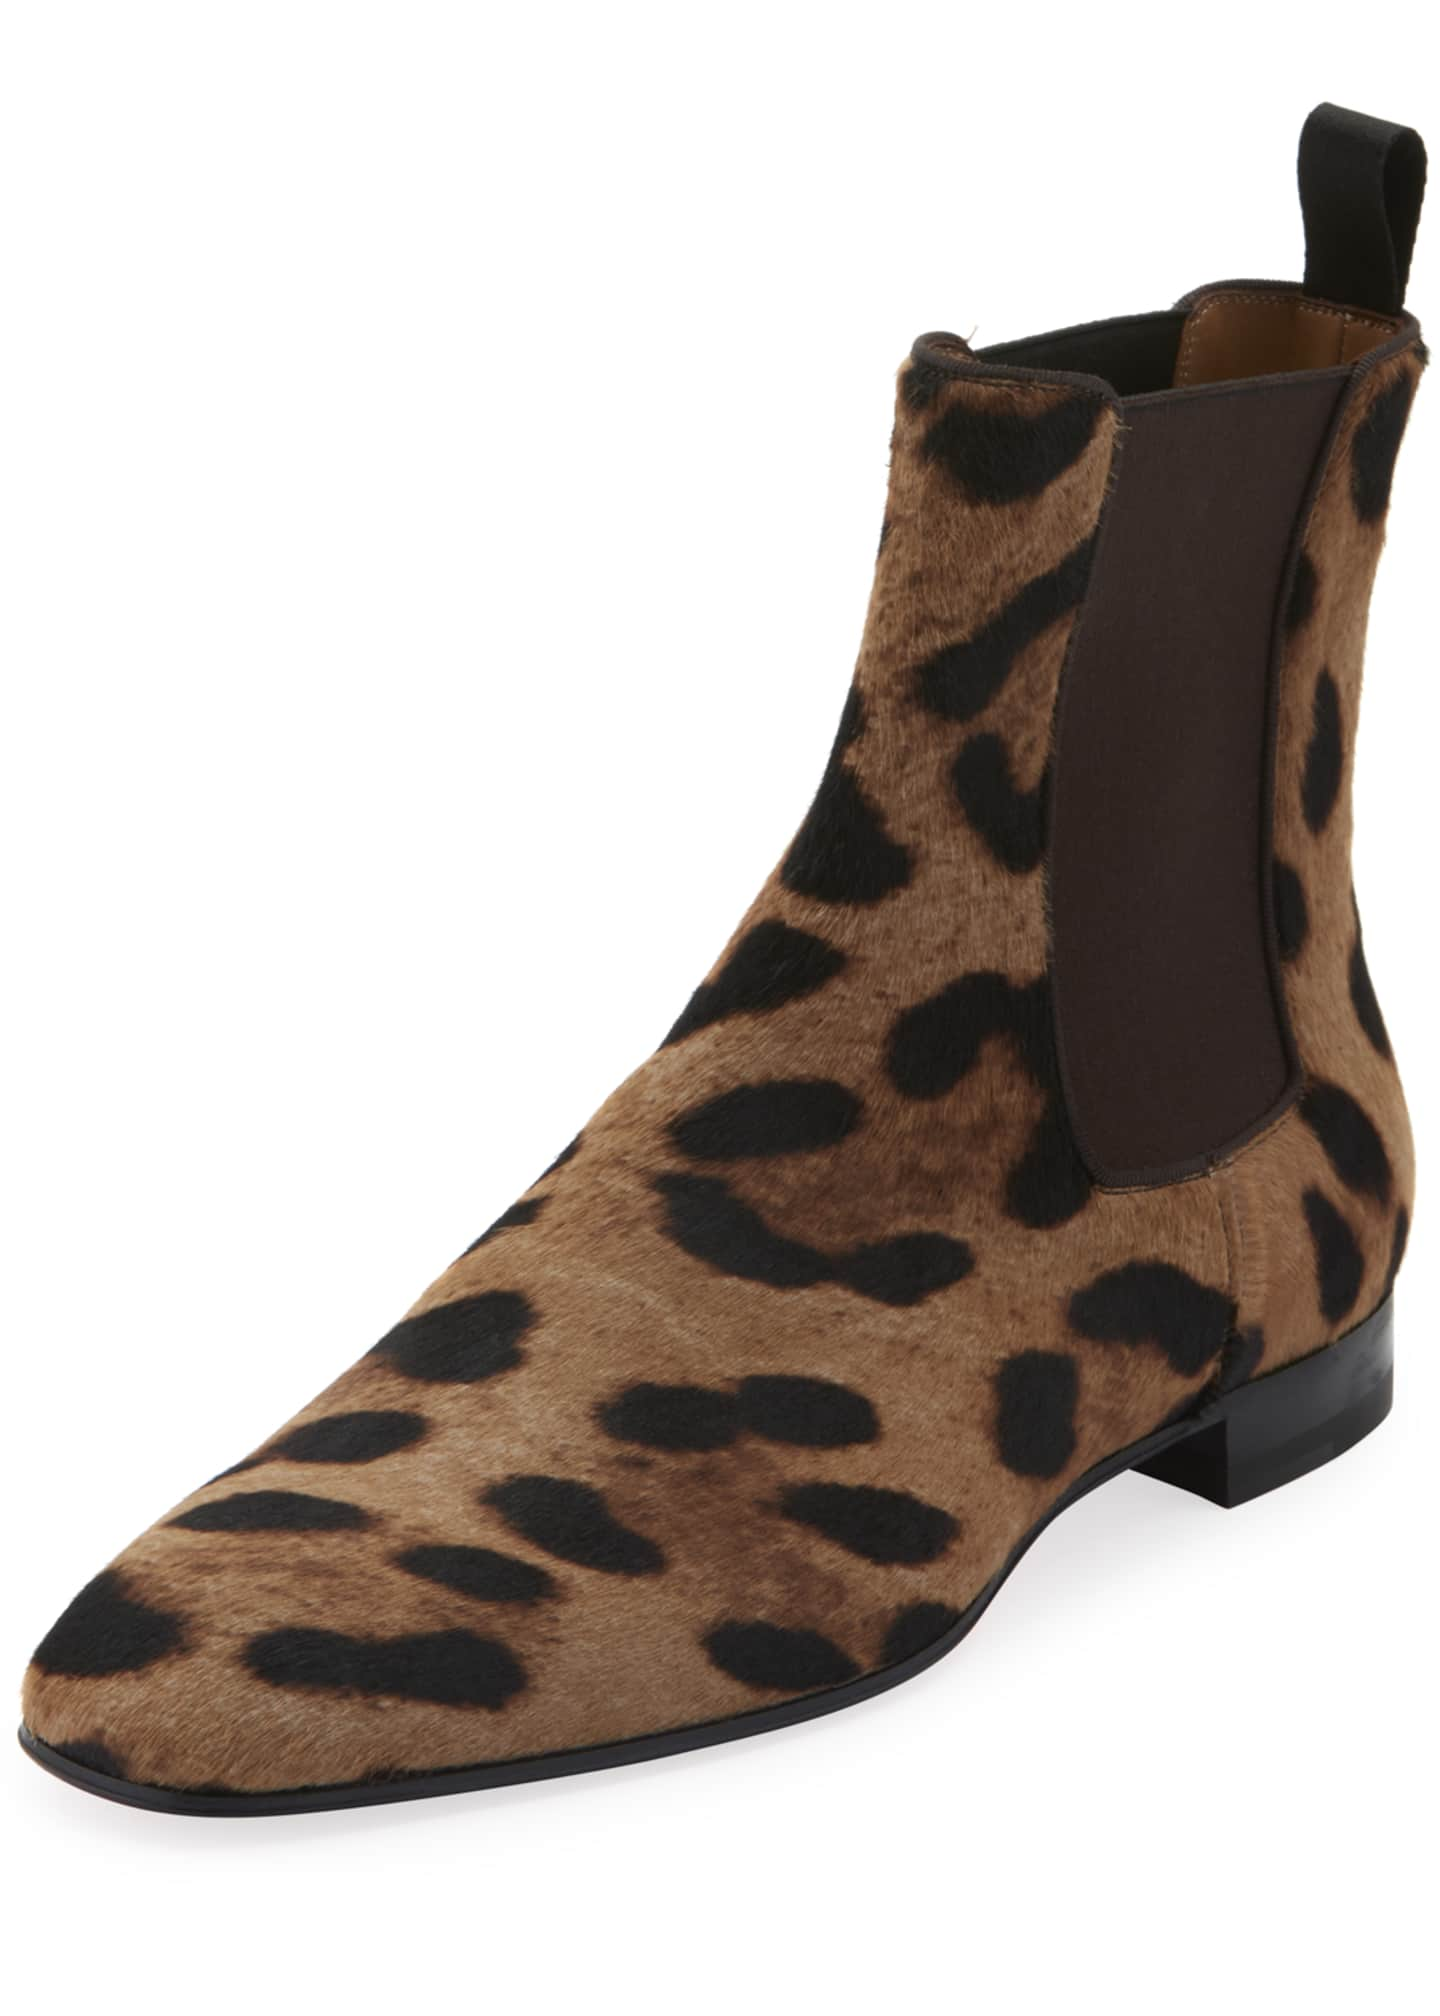 Christian Louboutin Men's Roadie Orlato Leopard Calf Hair